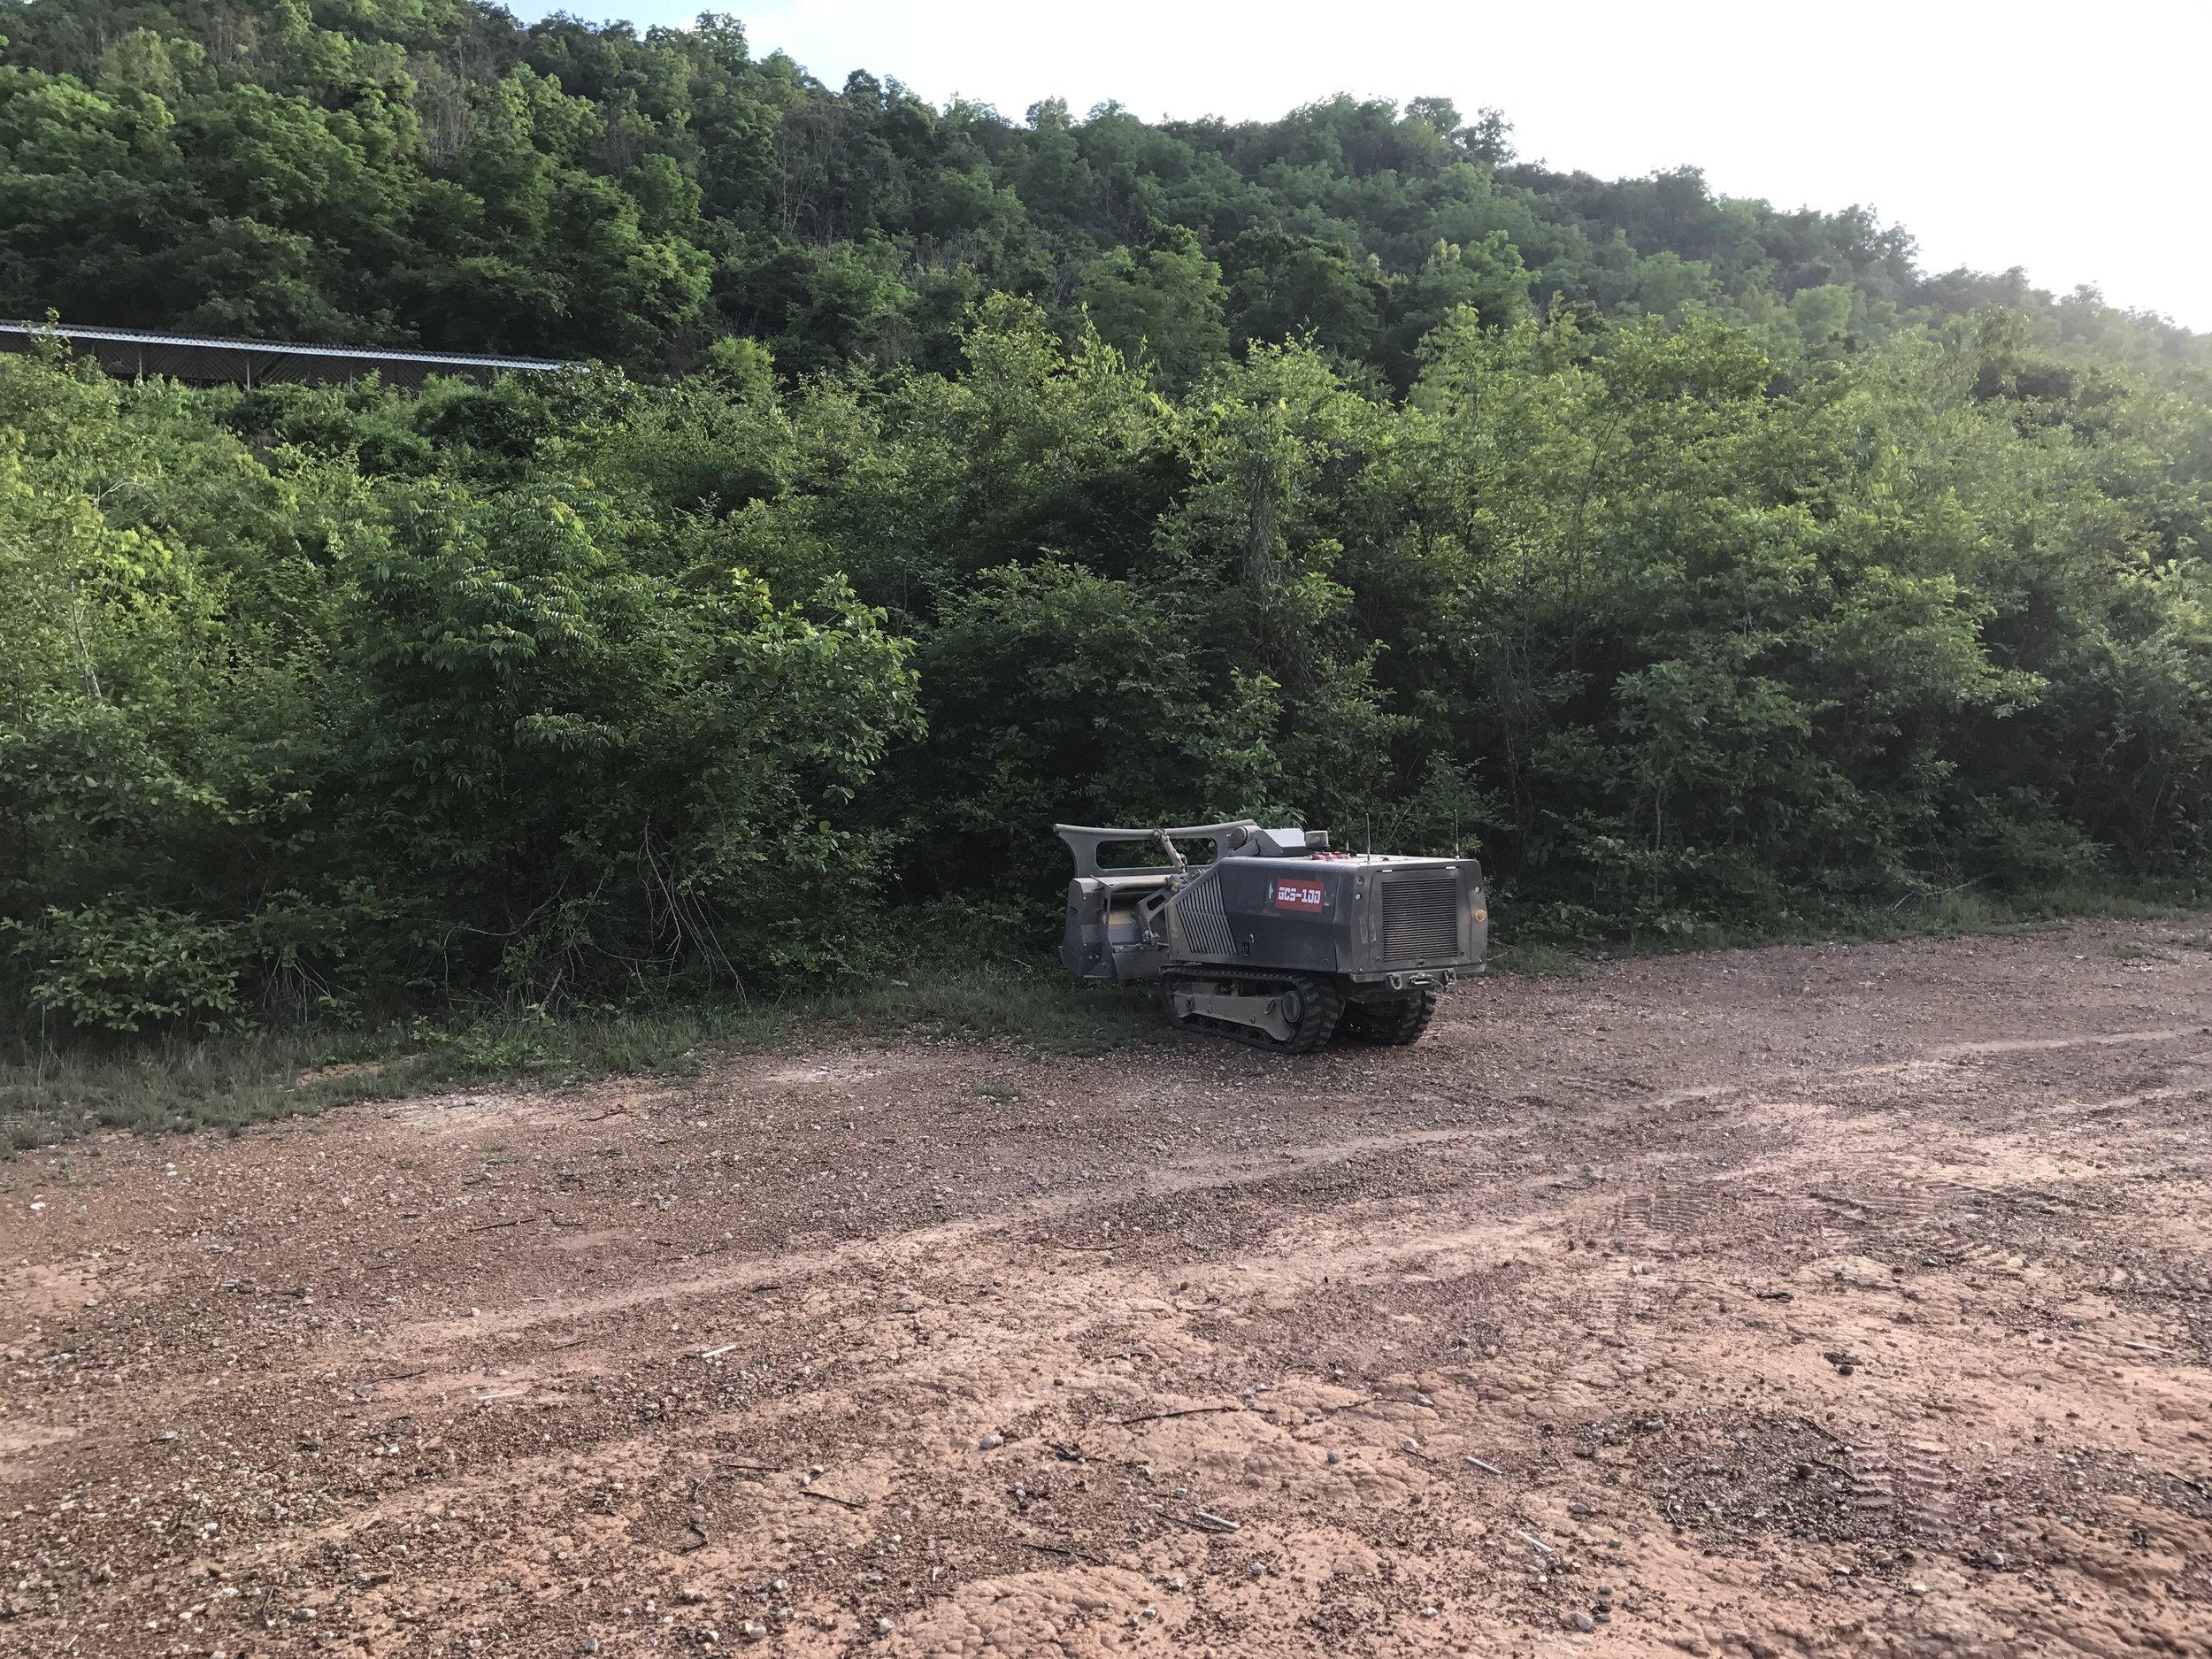 GCS-100 - Clearance of heavy dense vegetation